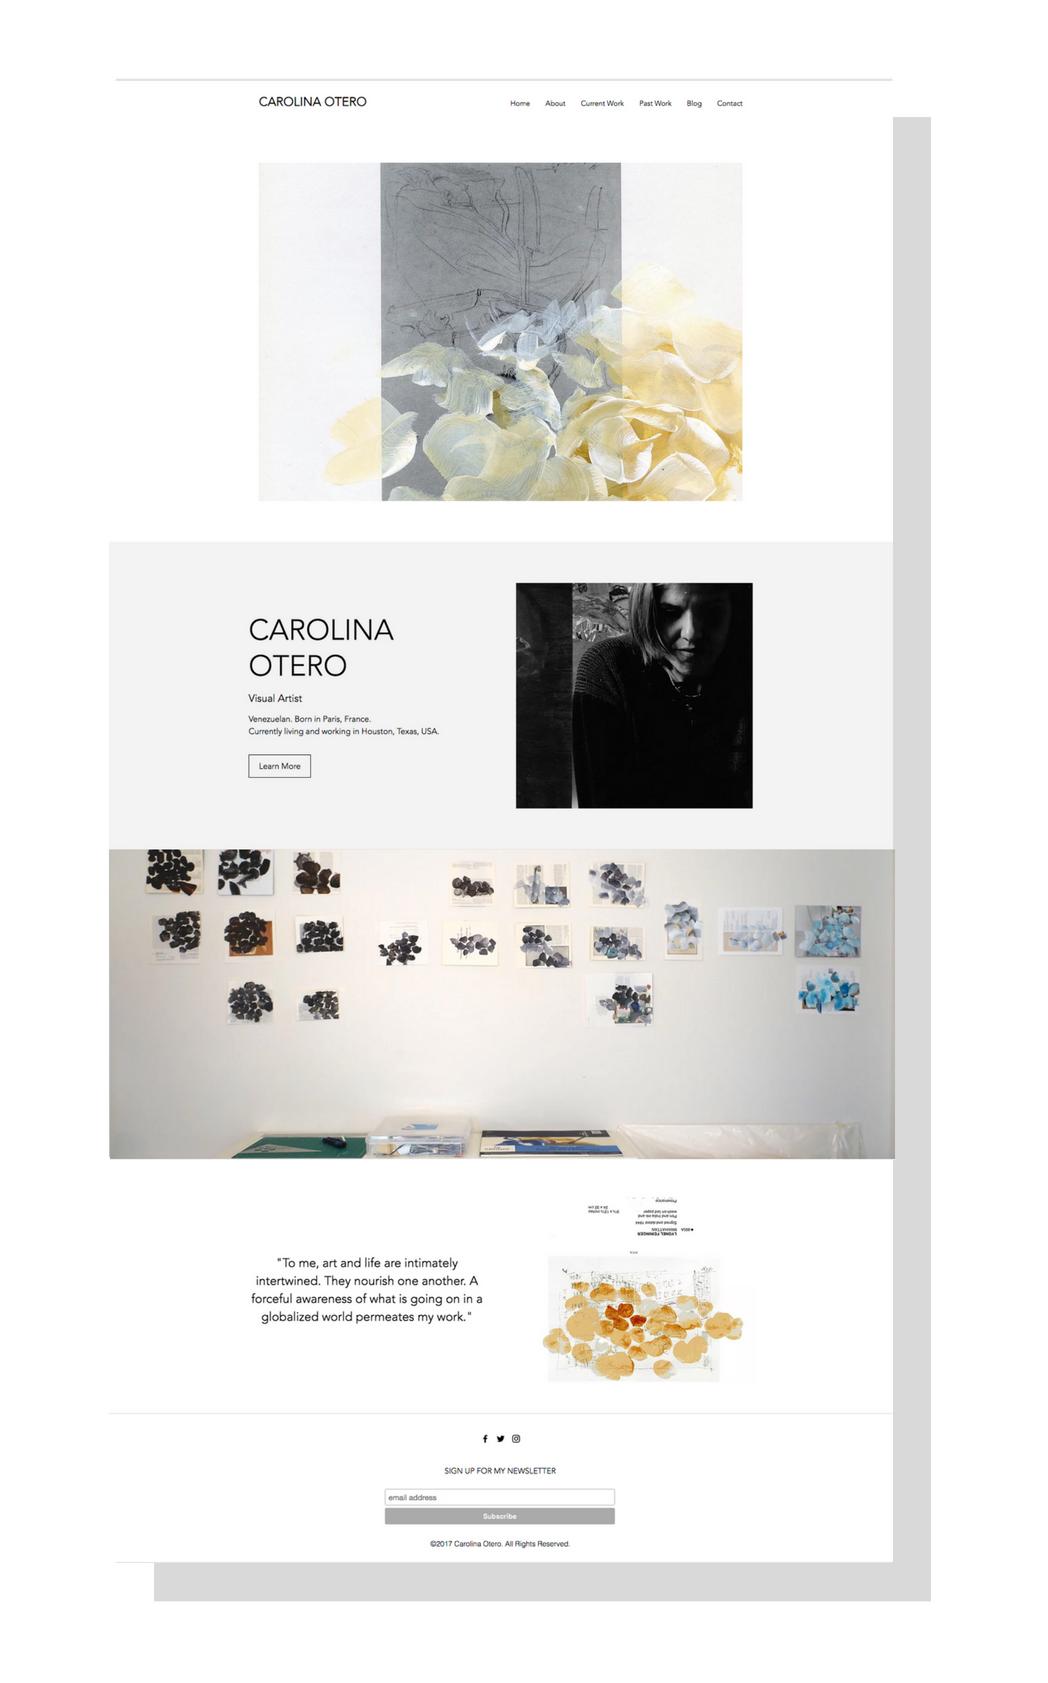 Carolina-Otero_home-page.png